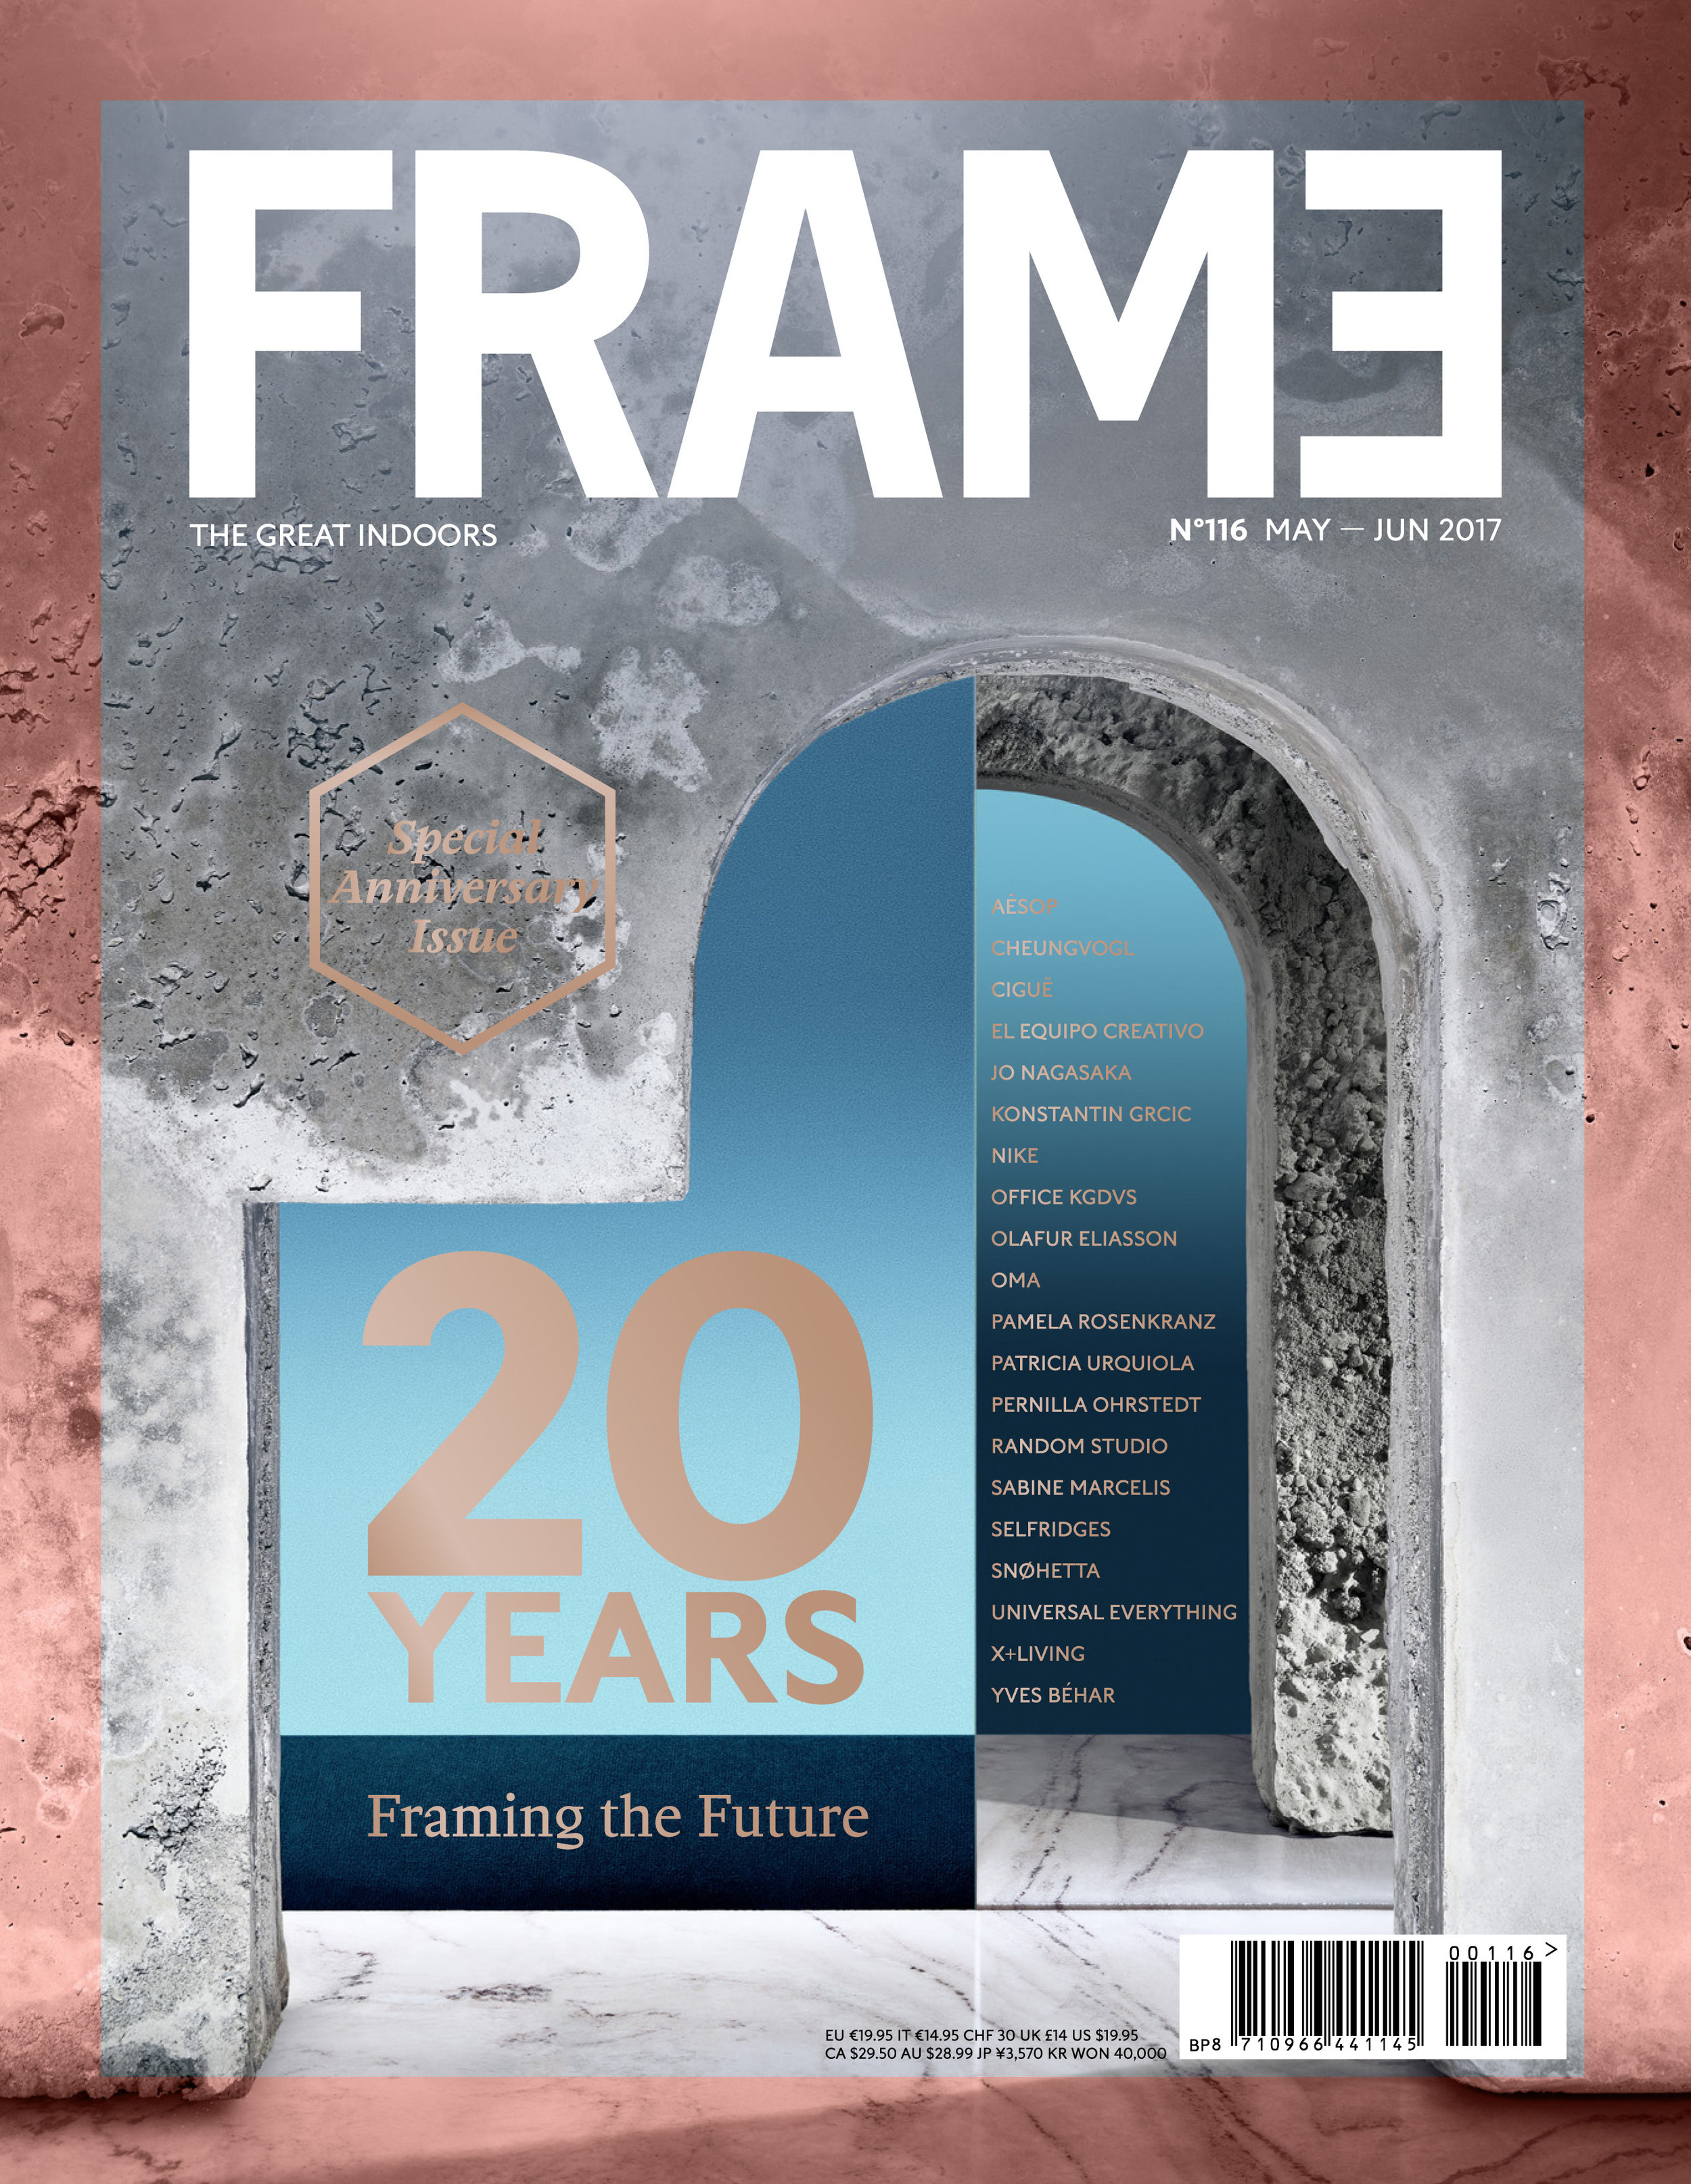 Frame Magazine - Rest, Relax, Retreat